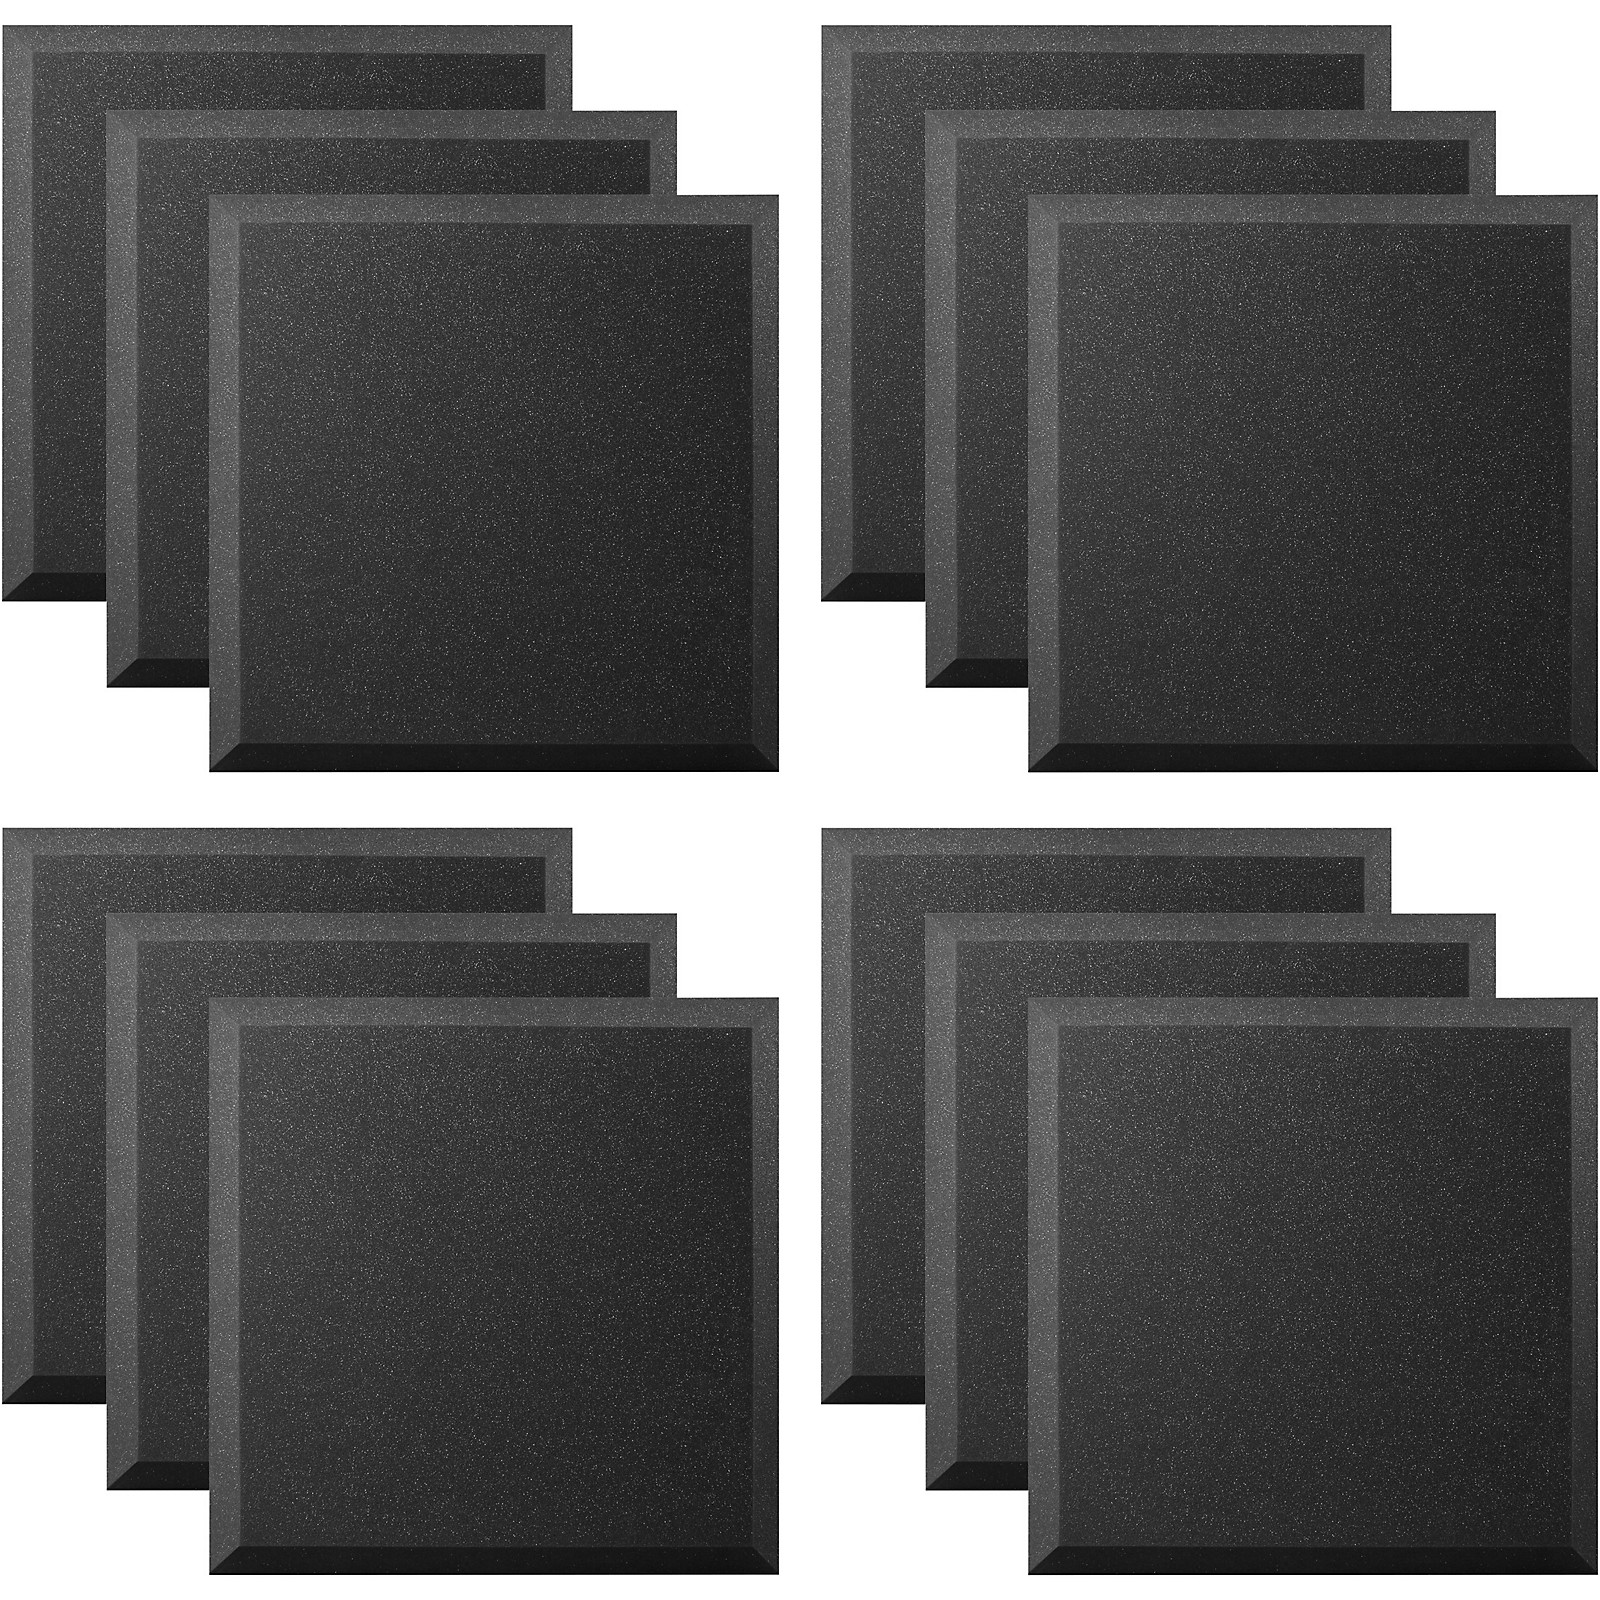 Ultimate Acoustics Acoustic Panel - 24x24x2 Bevel (12 Pack)